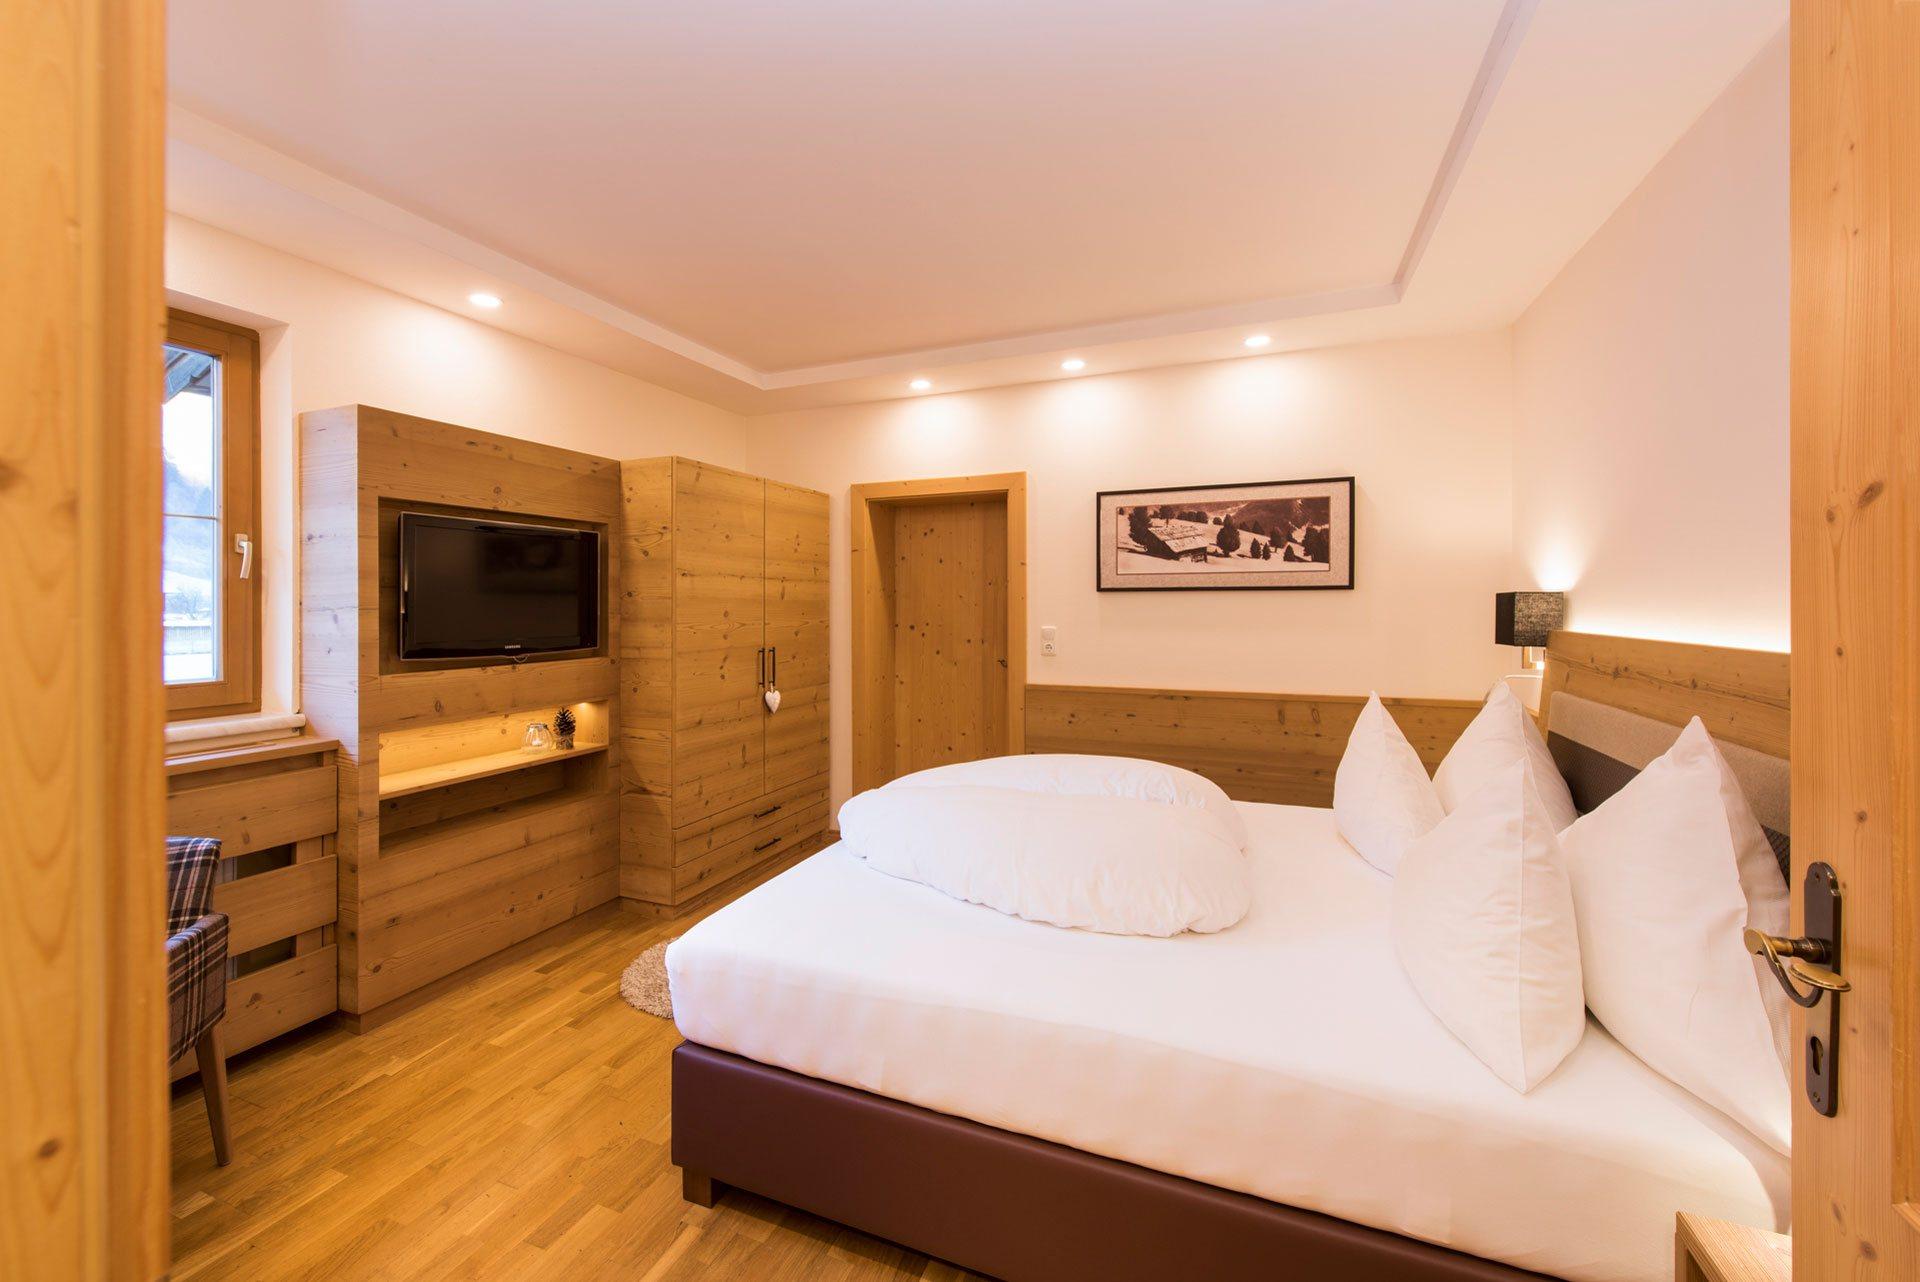 Zimmer im Hotel Brunnenhof in Neustift im Stubaital